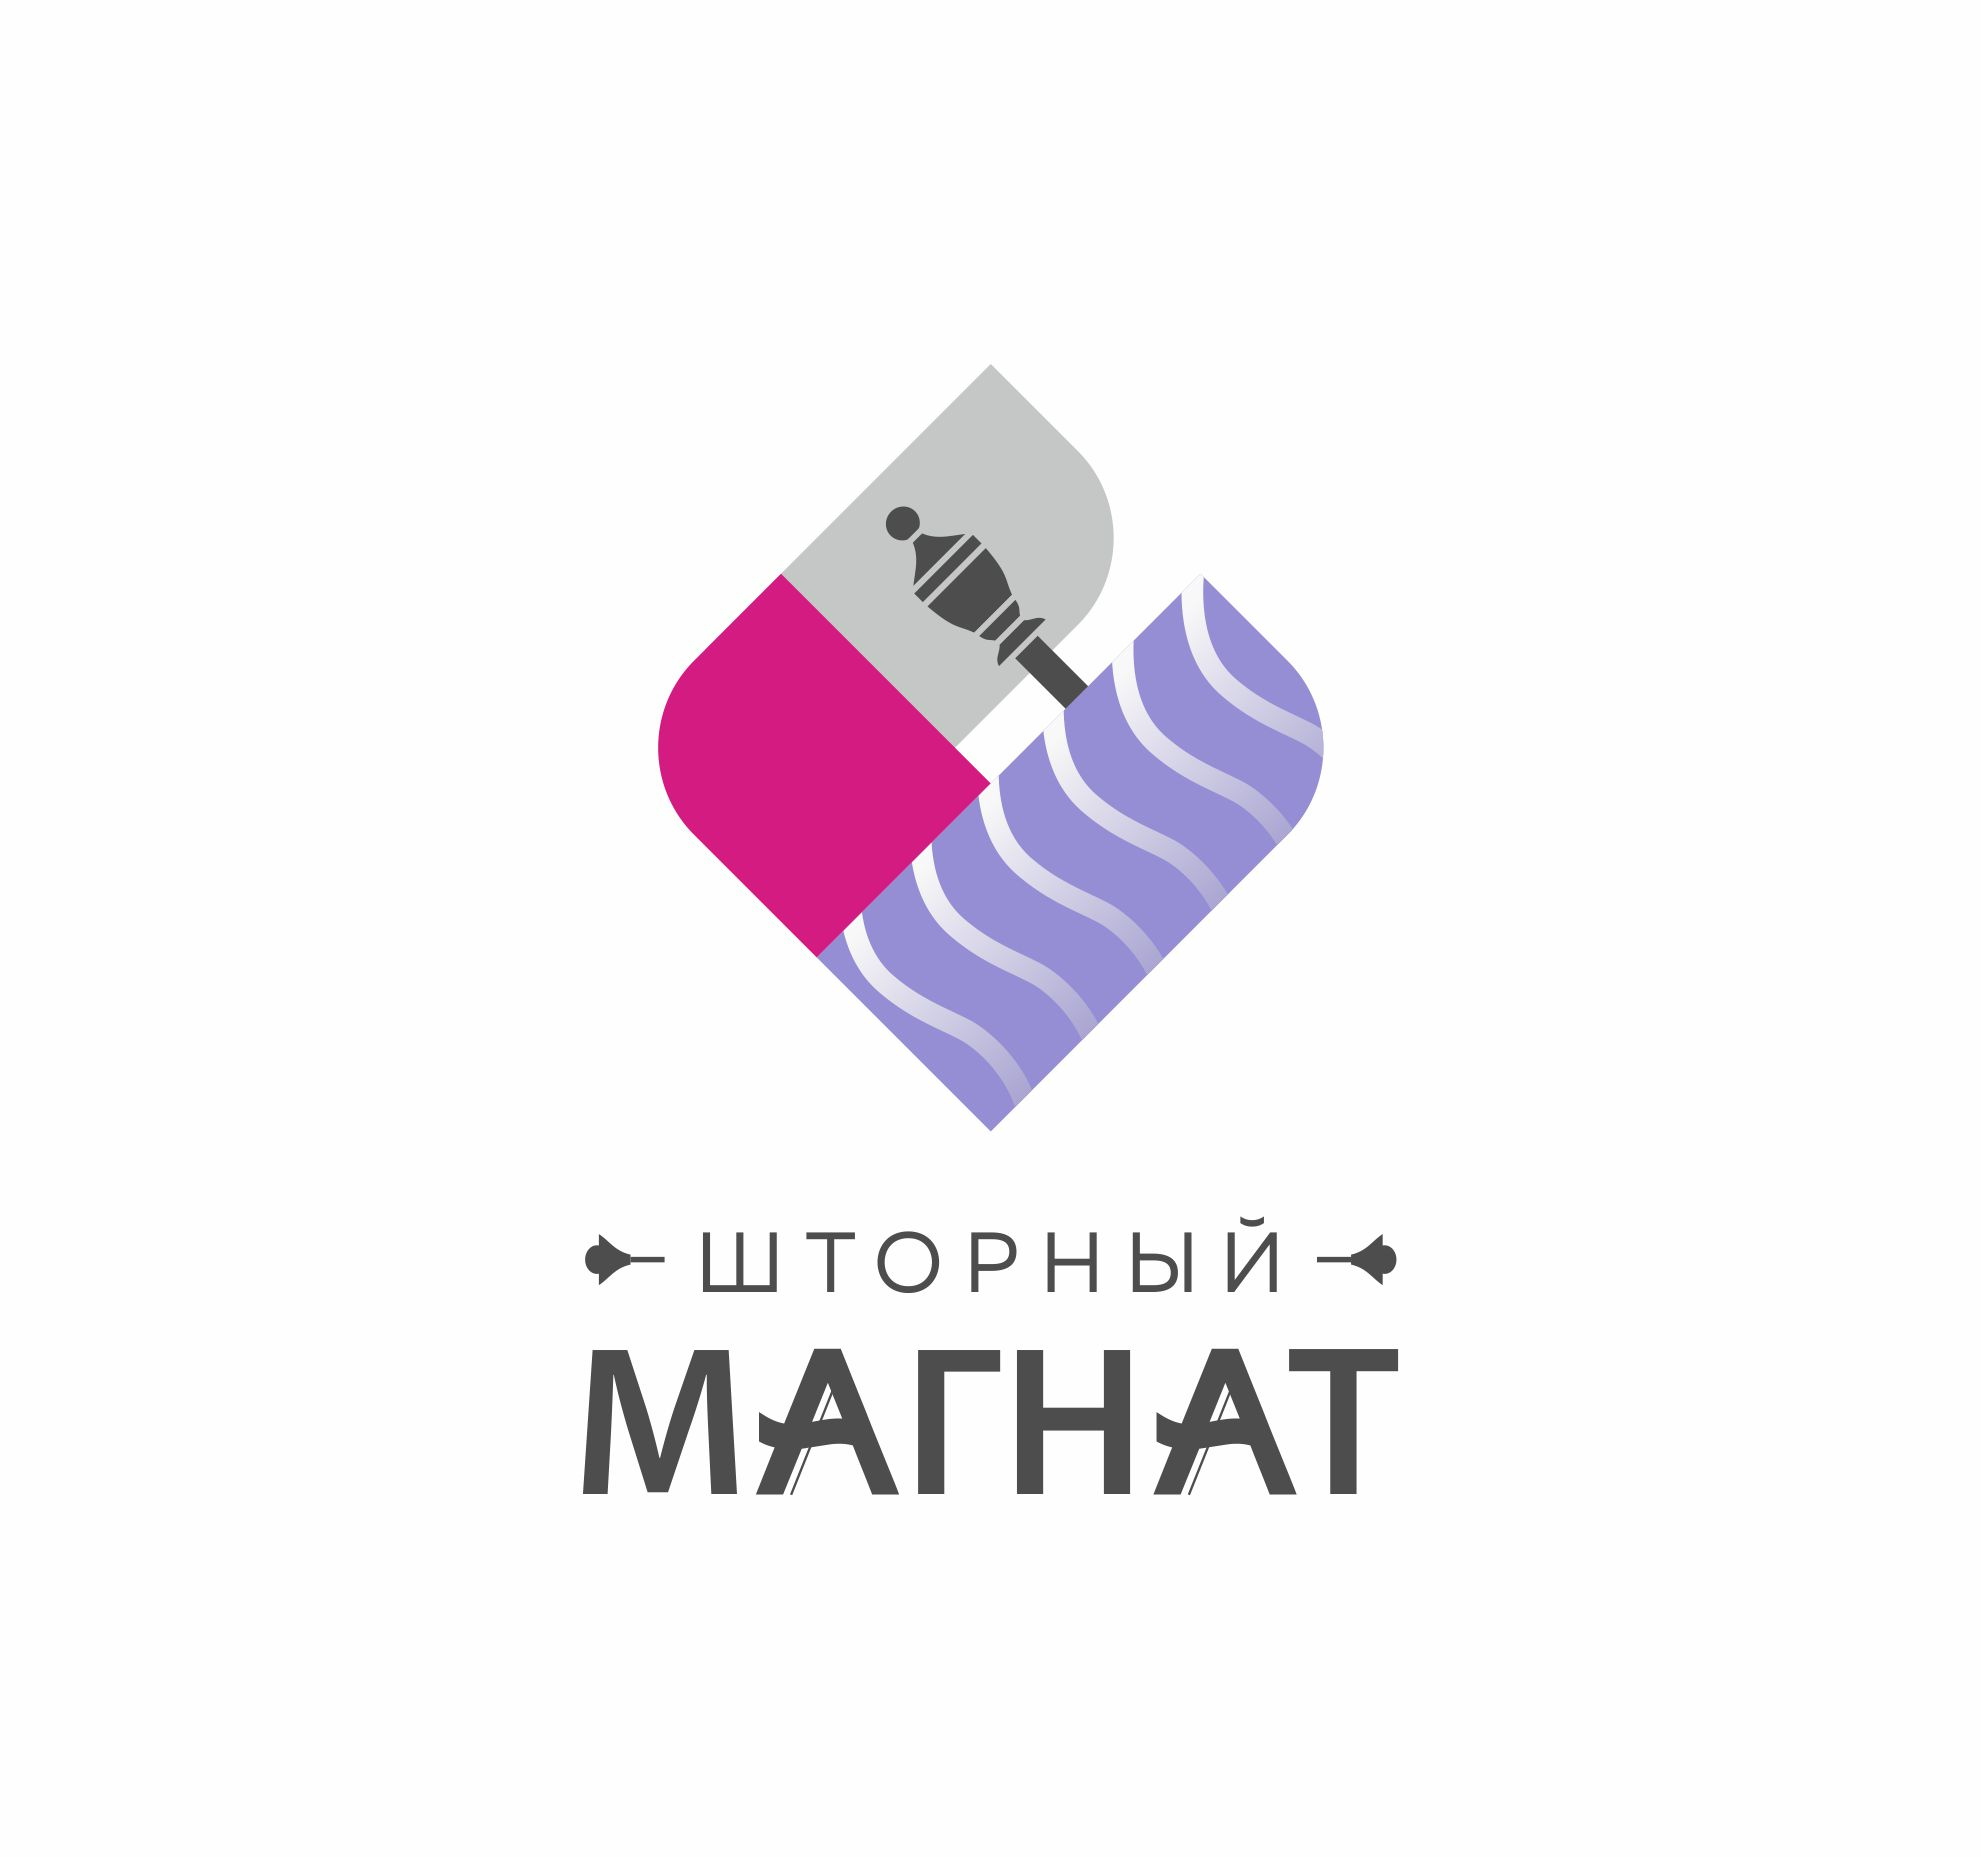 Логотип и фирменный стиль для магазина тканей. фото f_4375cd96638e254d.jpg